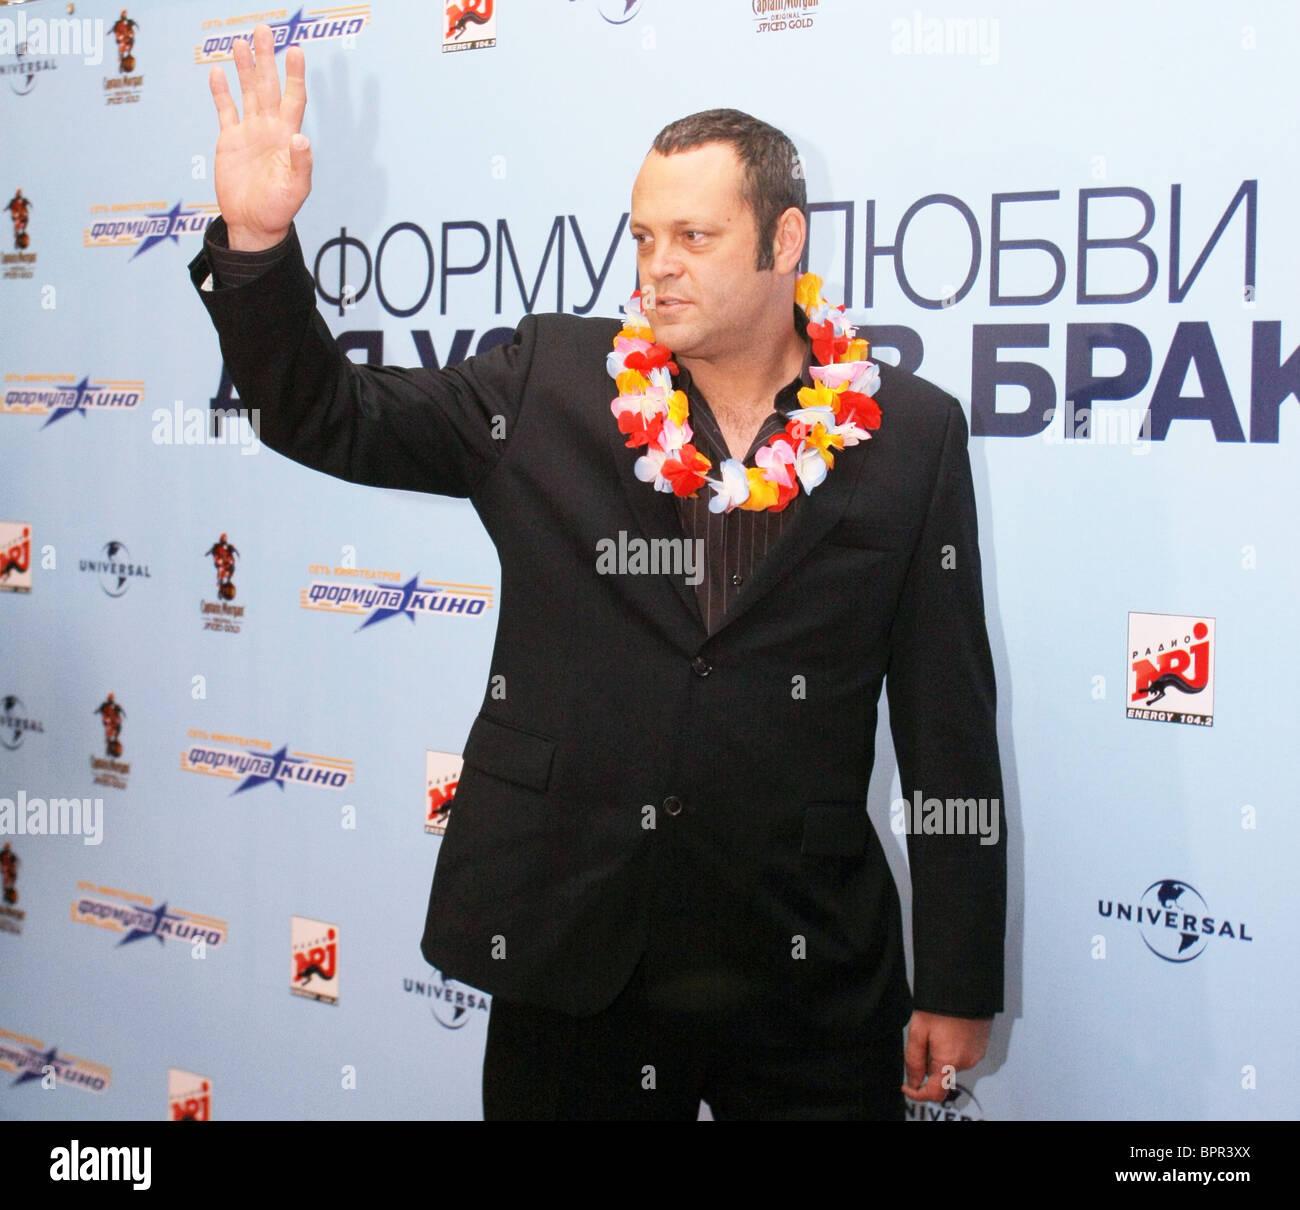 Actors Vince Vaughn and Malin Akerman visit Moscow - Stock Image